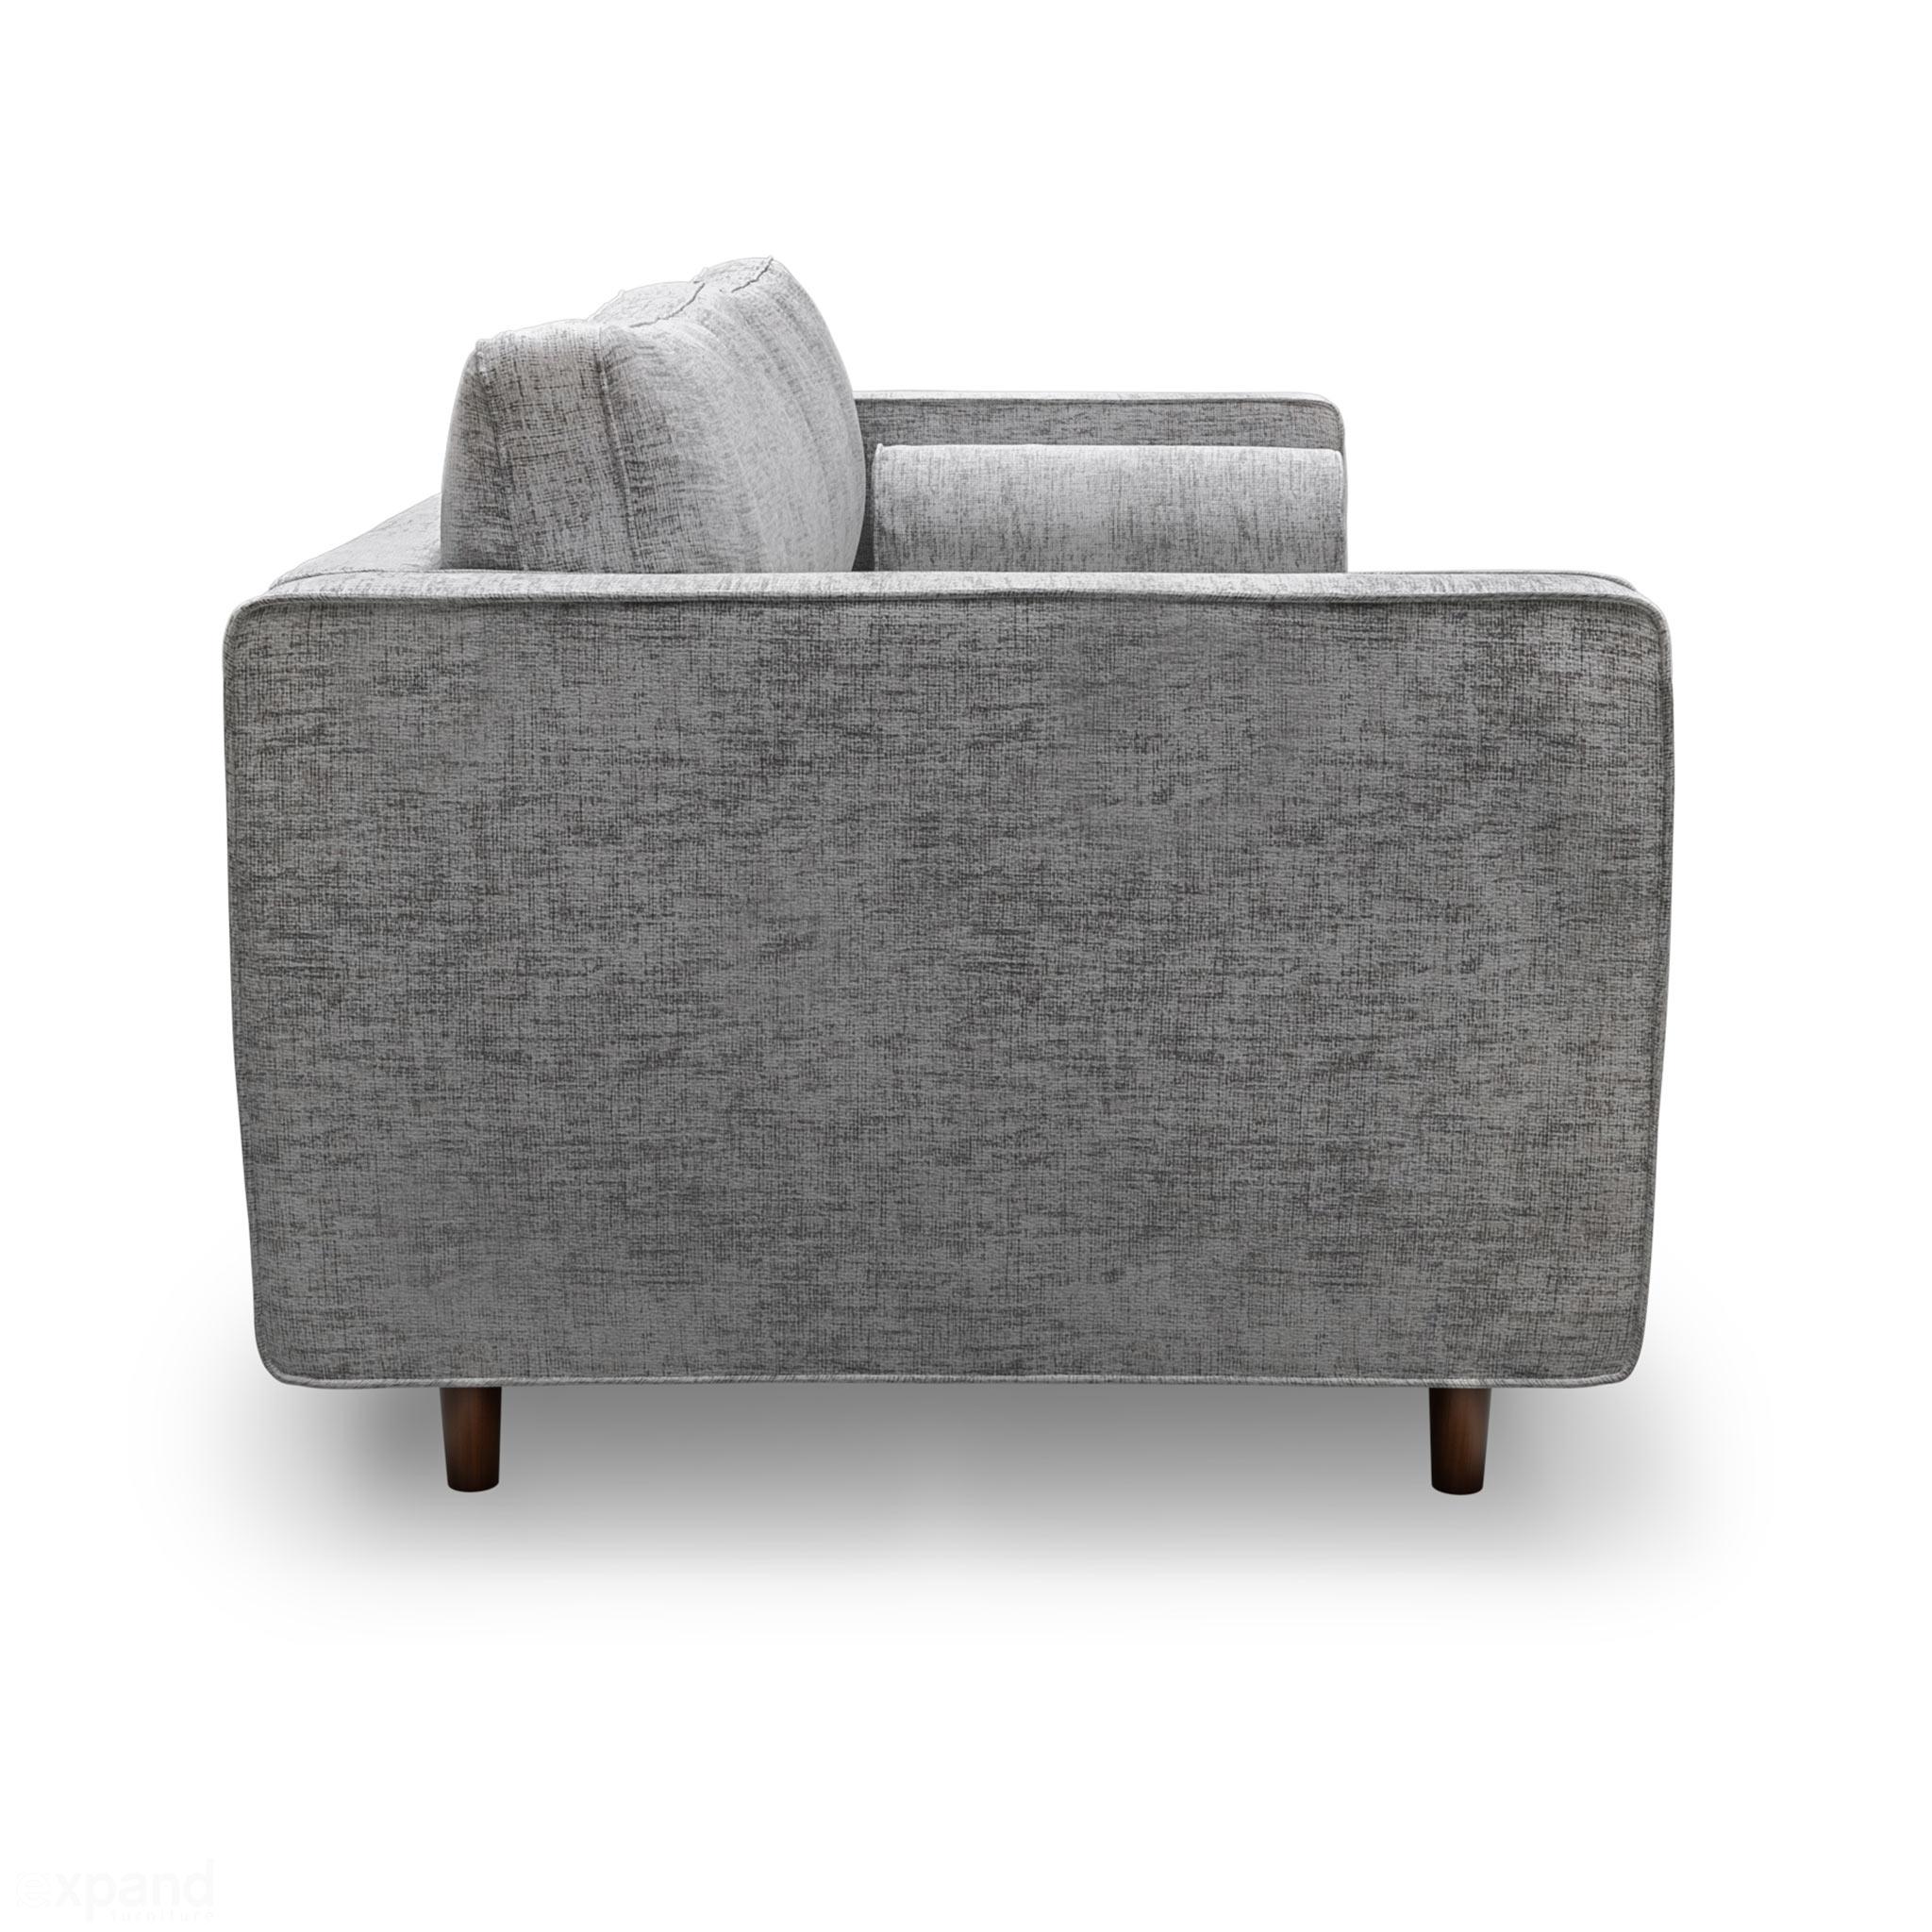 Scandormi Modern Sofa: Grey mid-century tufted couch